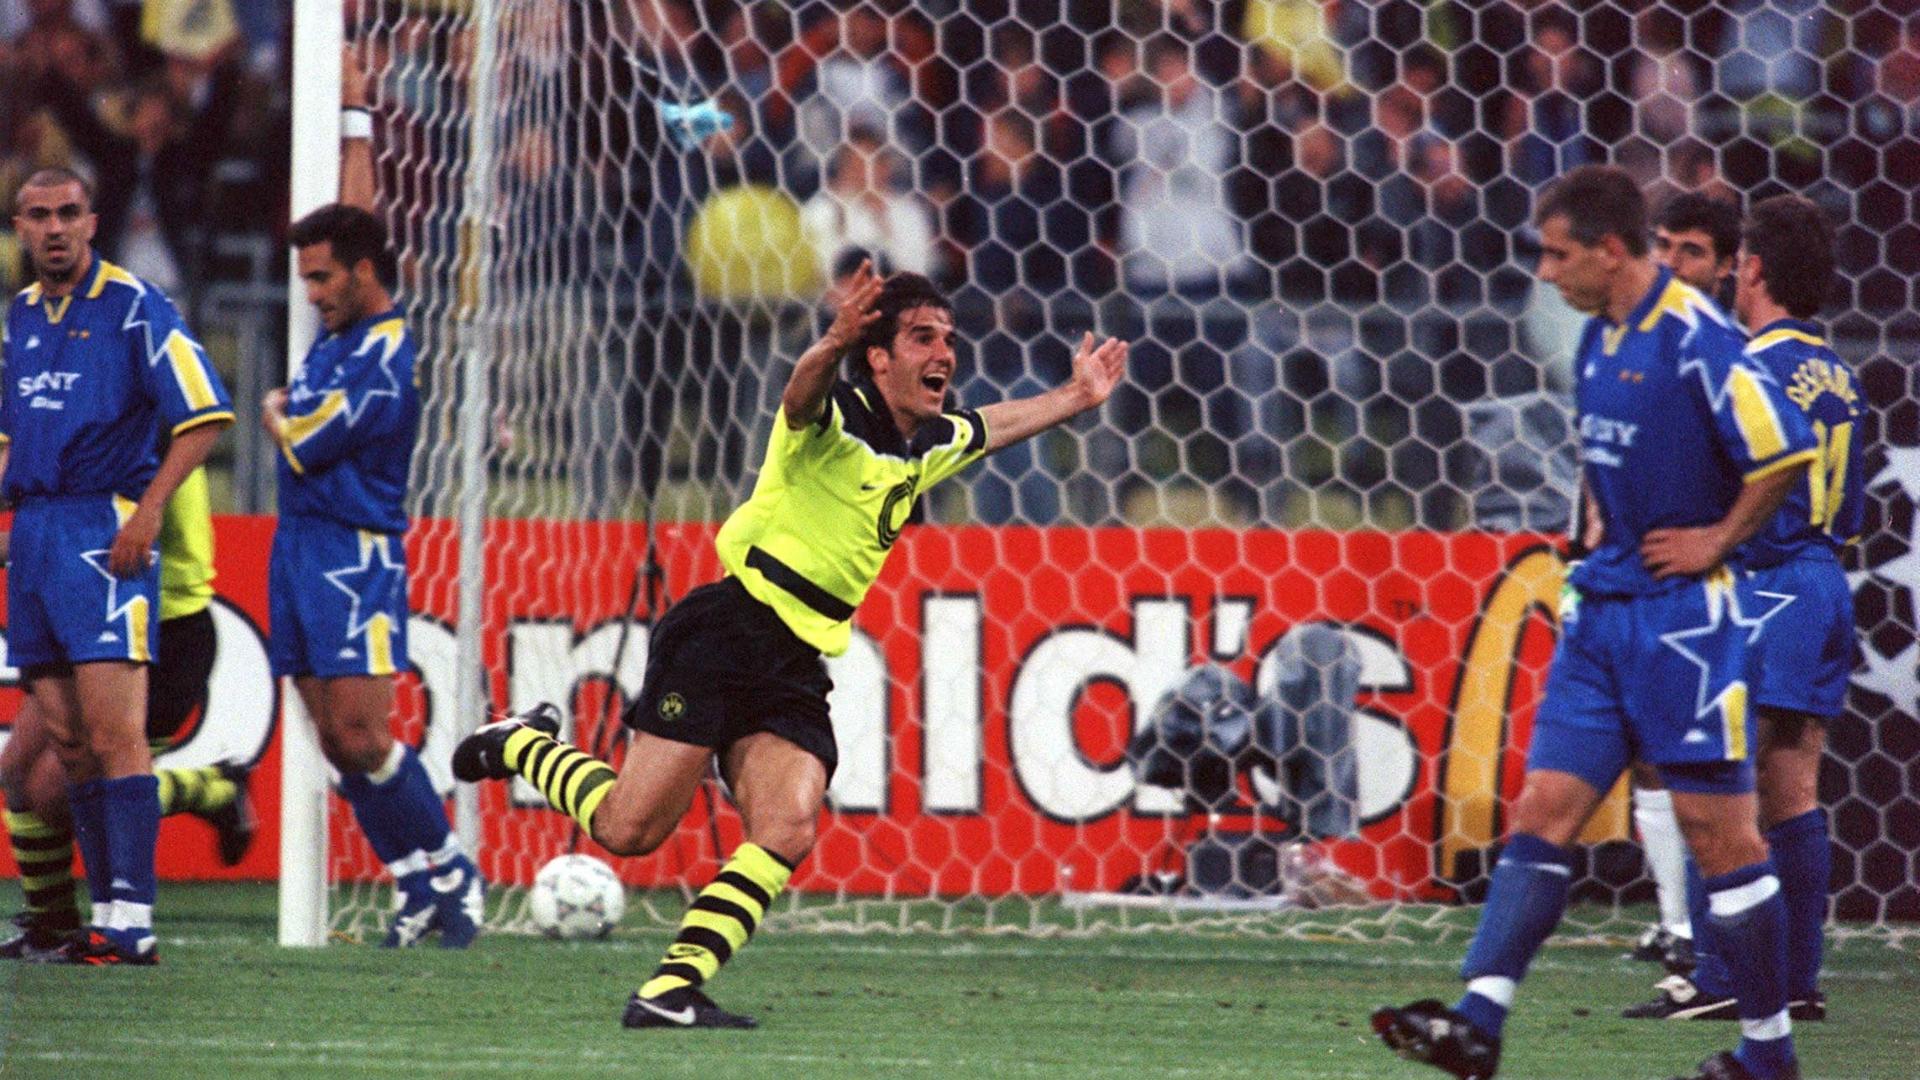 Borussia Dortmund - Juventus - Champions League - Final 05281997